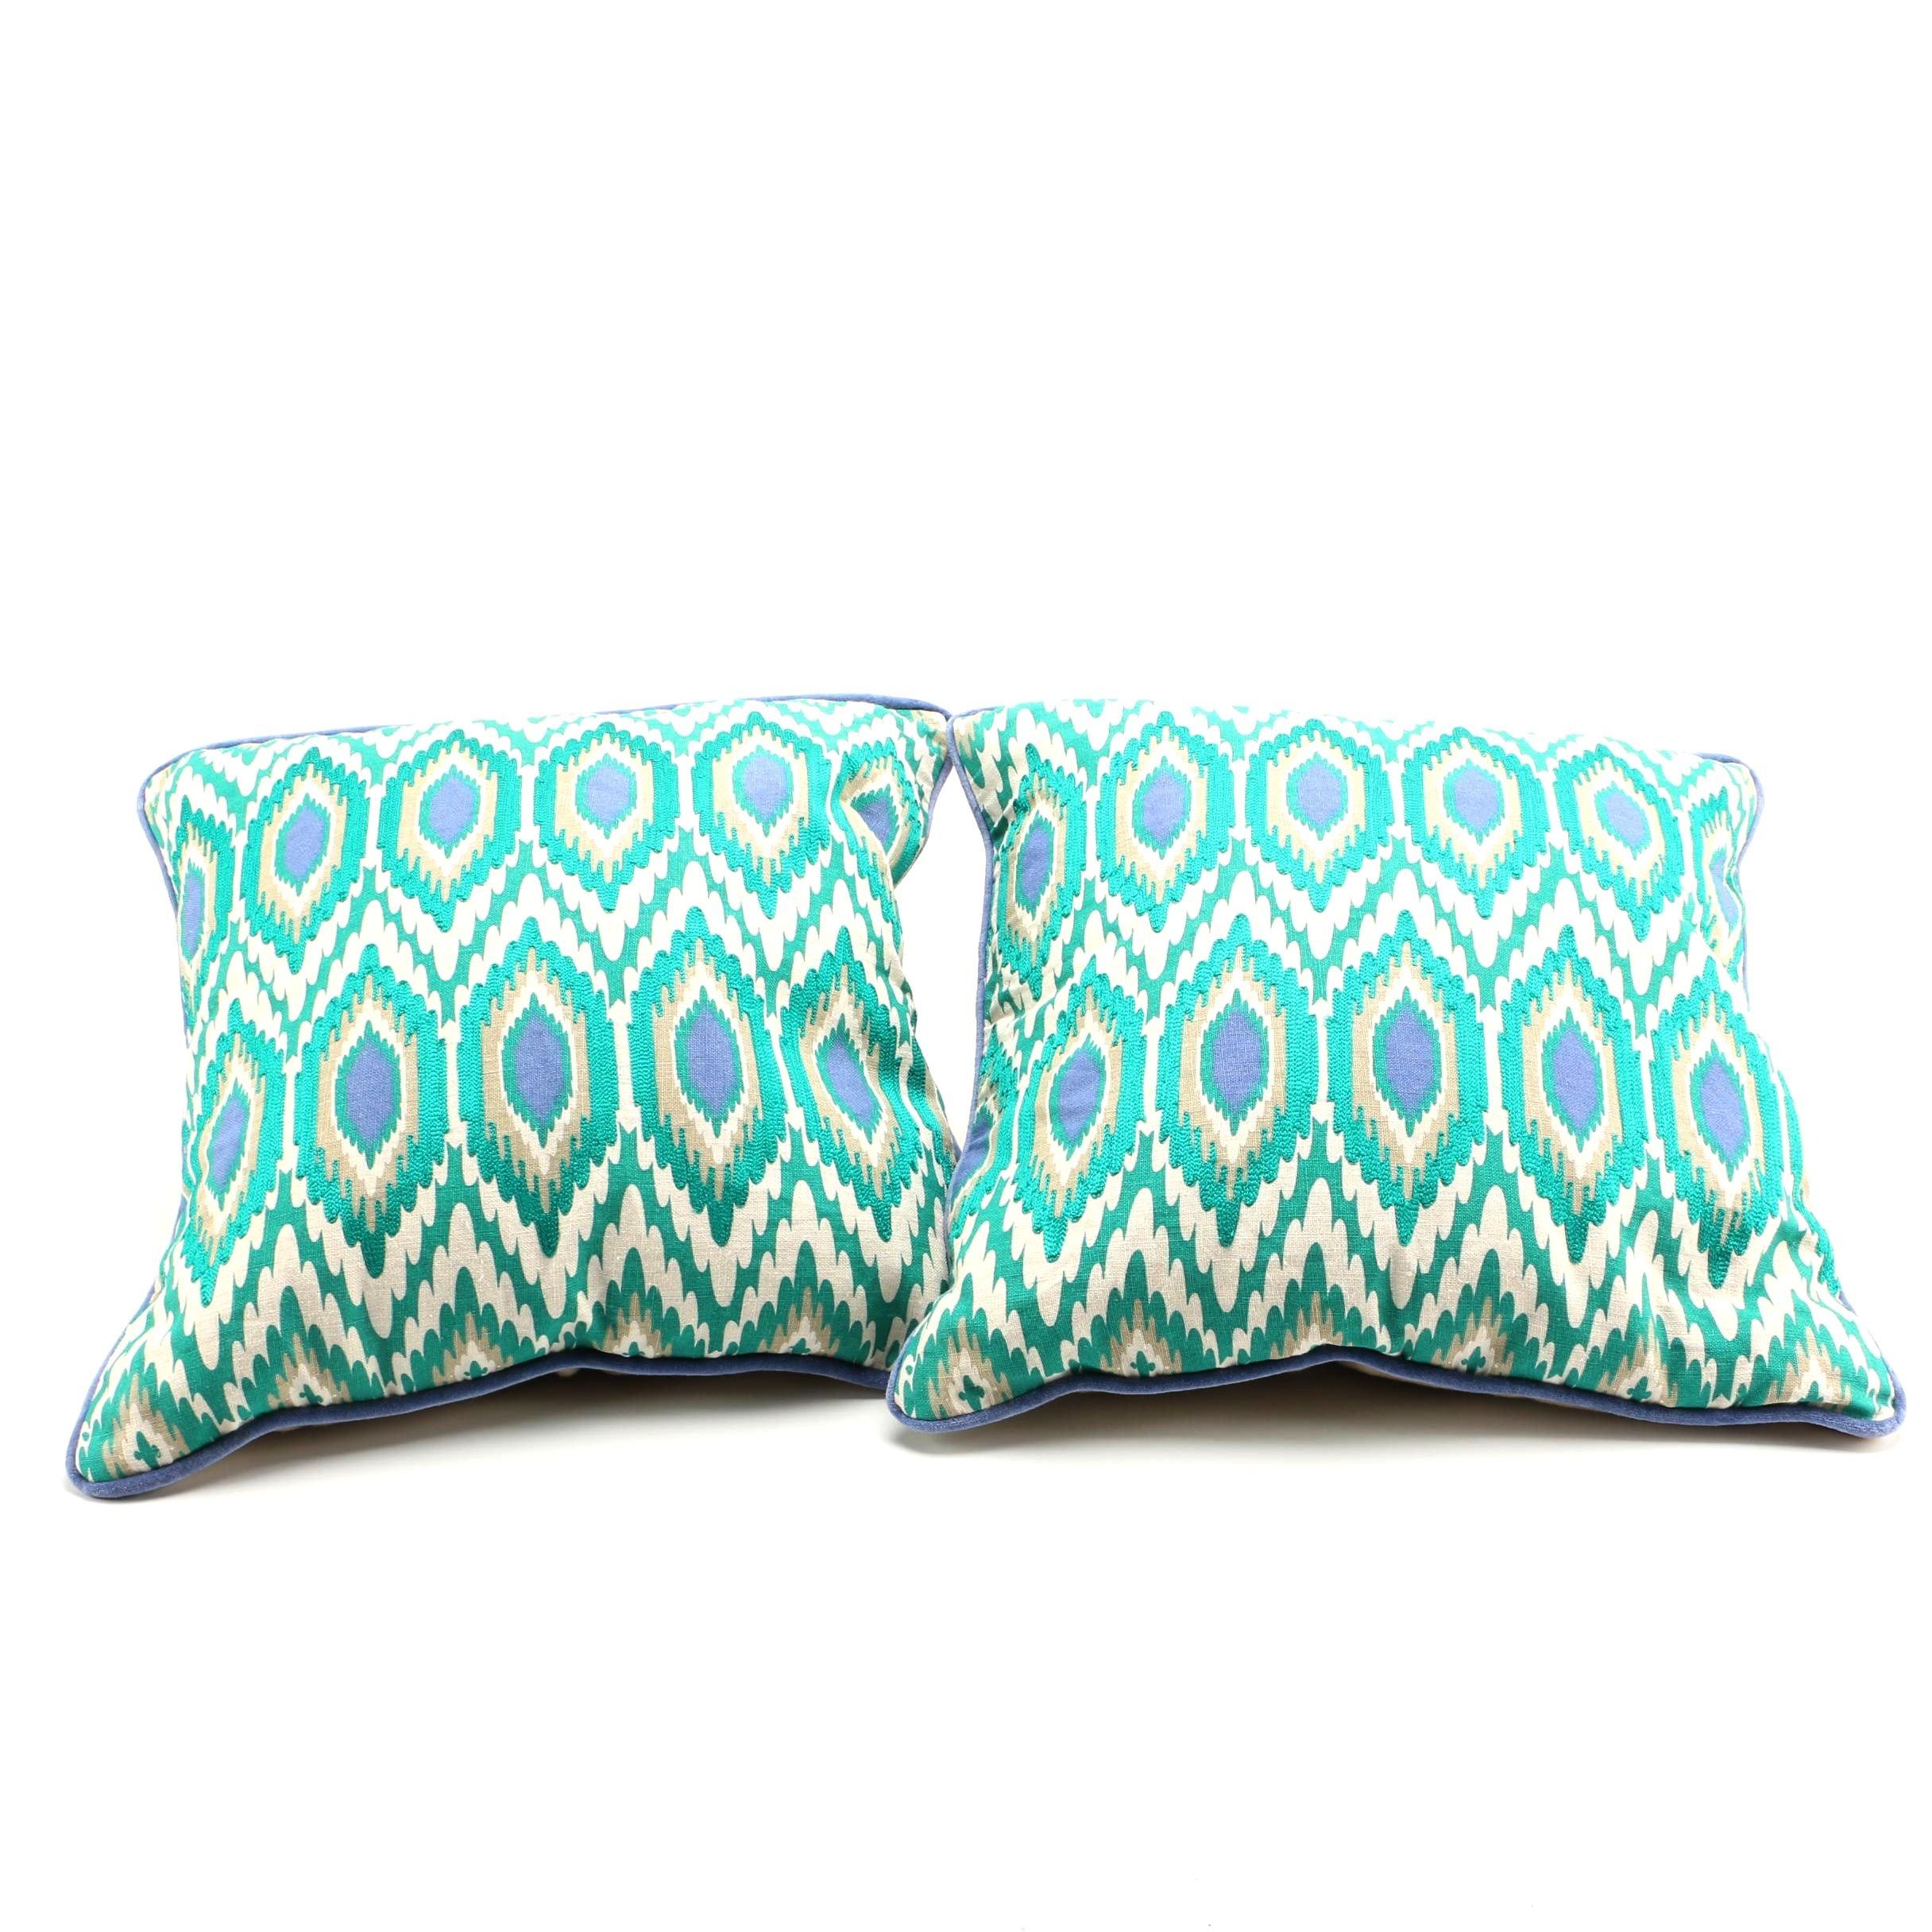 Pair Blue and Green Throw Pillows